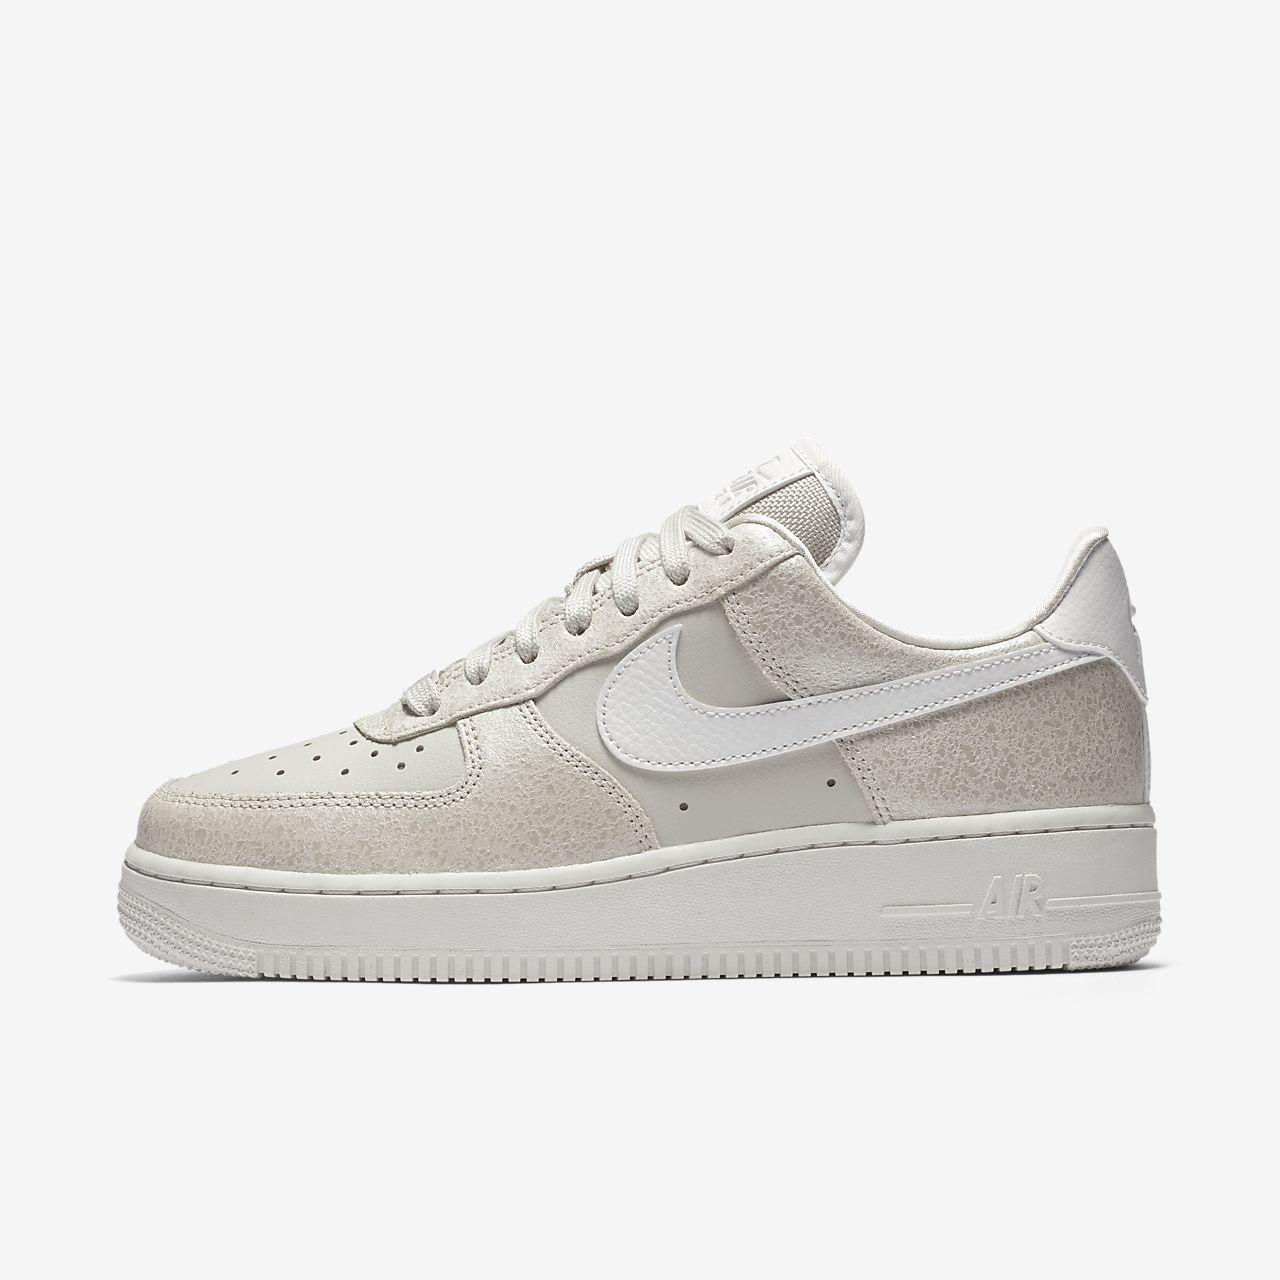 Air Force 1 07 Premium LX sneakers Nike dwq6ALMnz